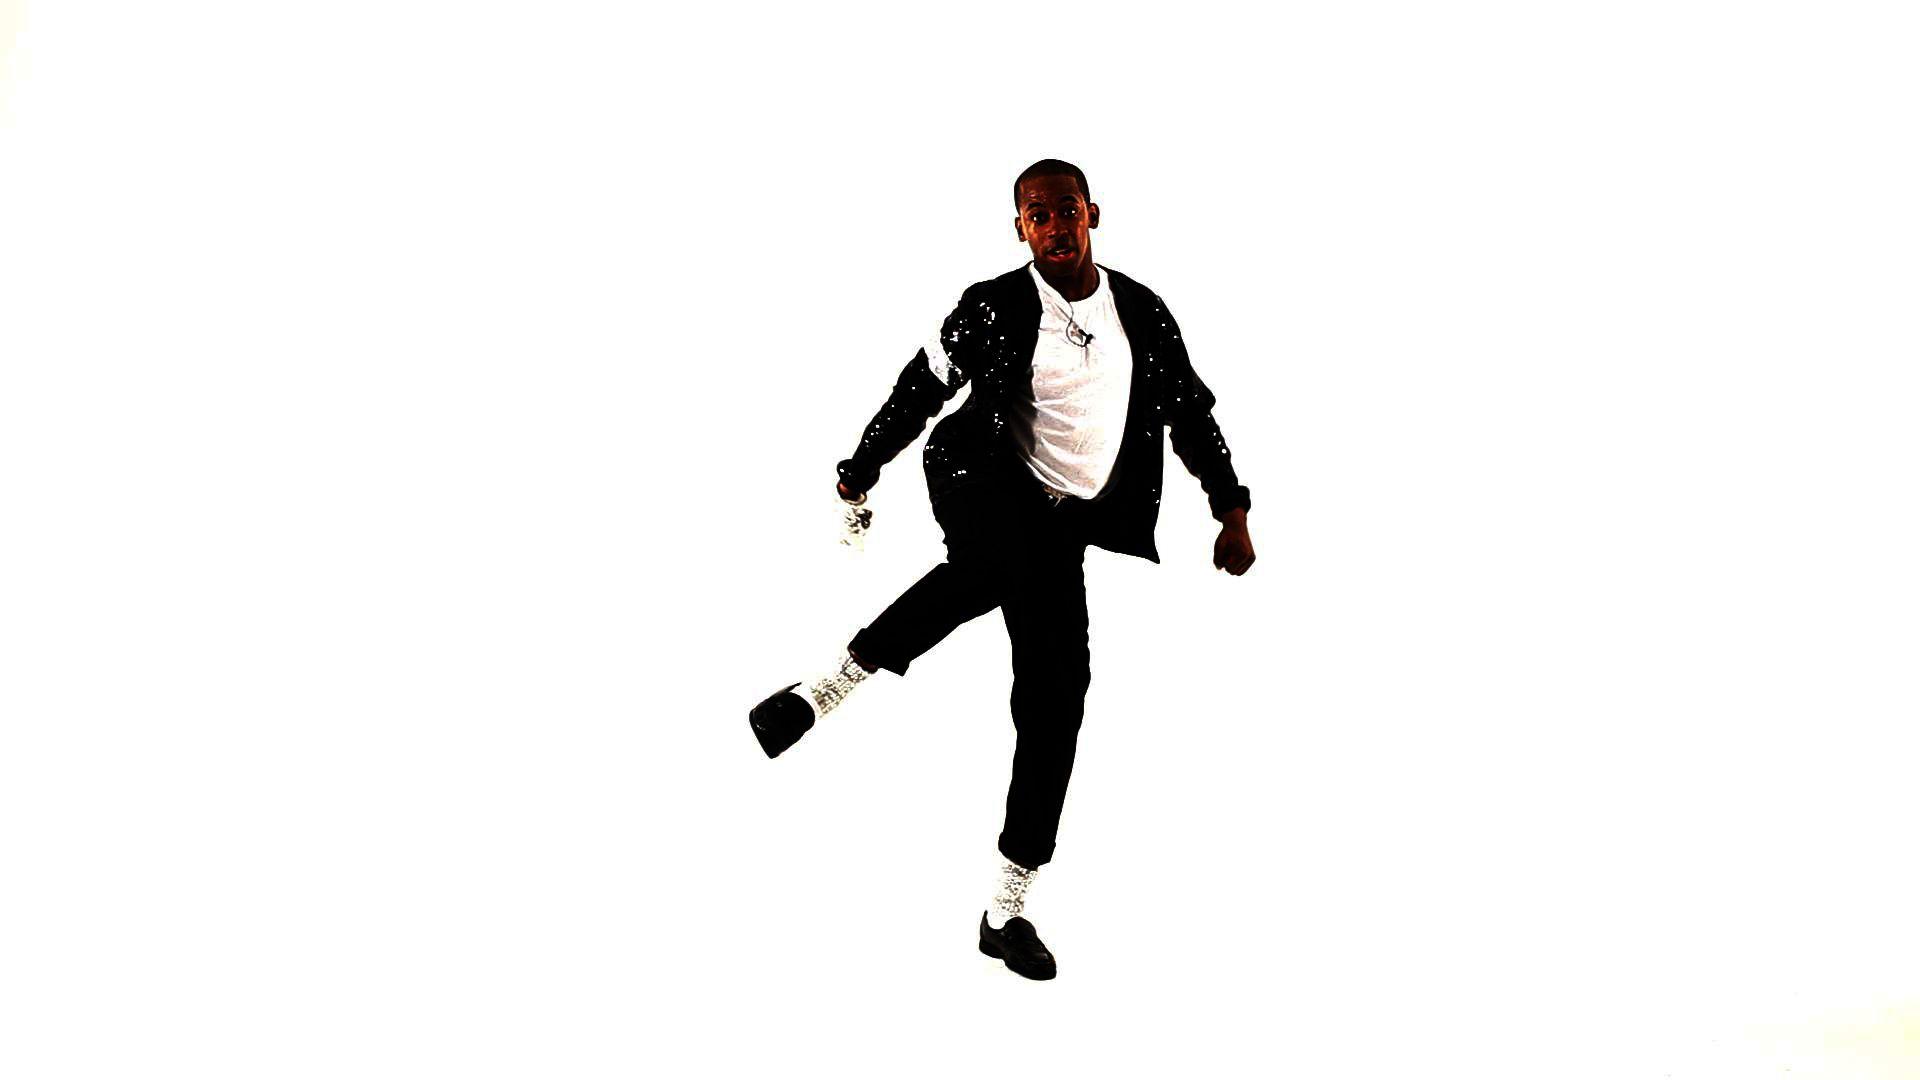 How To Do Billie Jean Dance Like Michael Jackson Pt 4